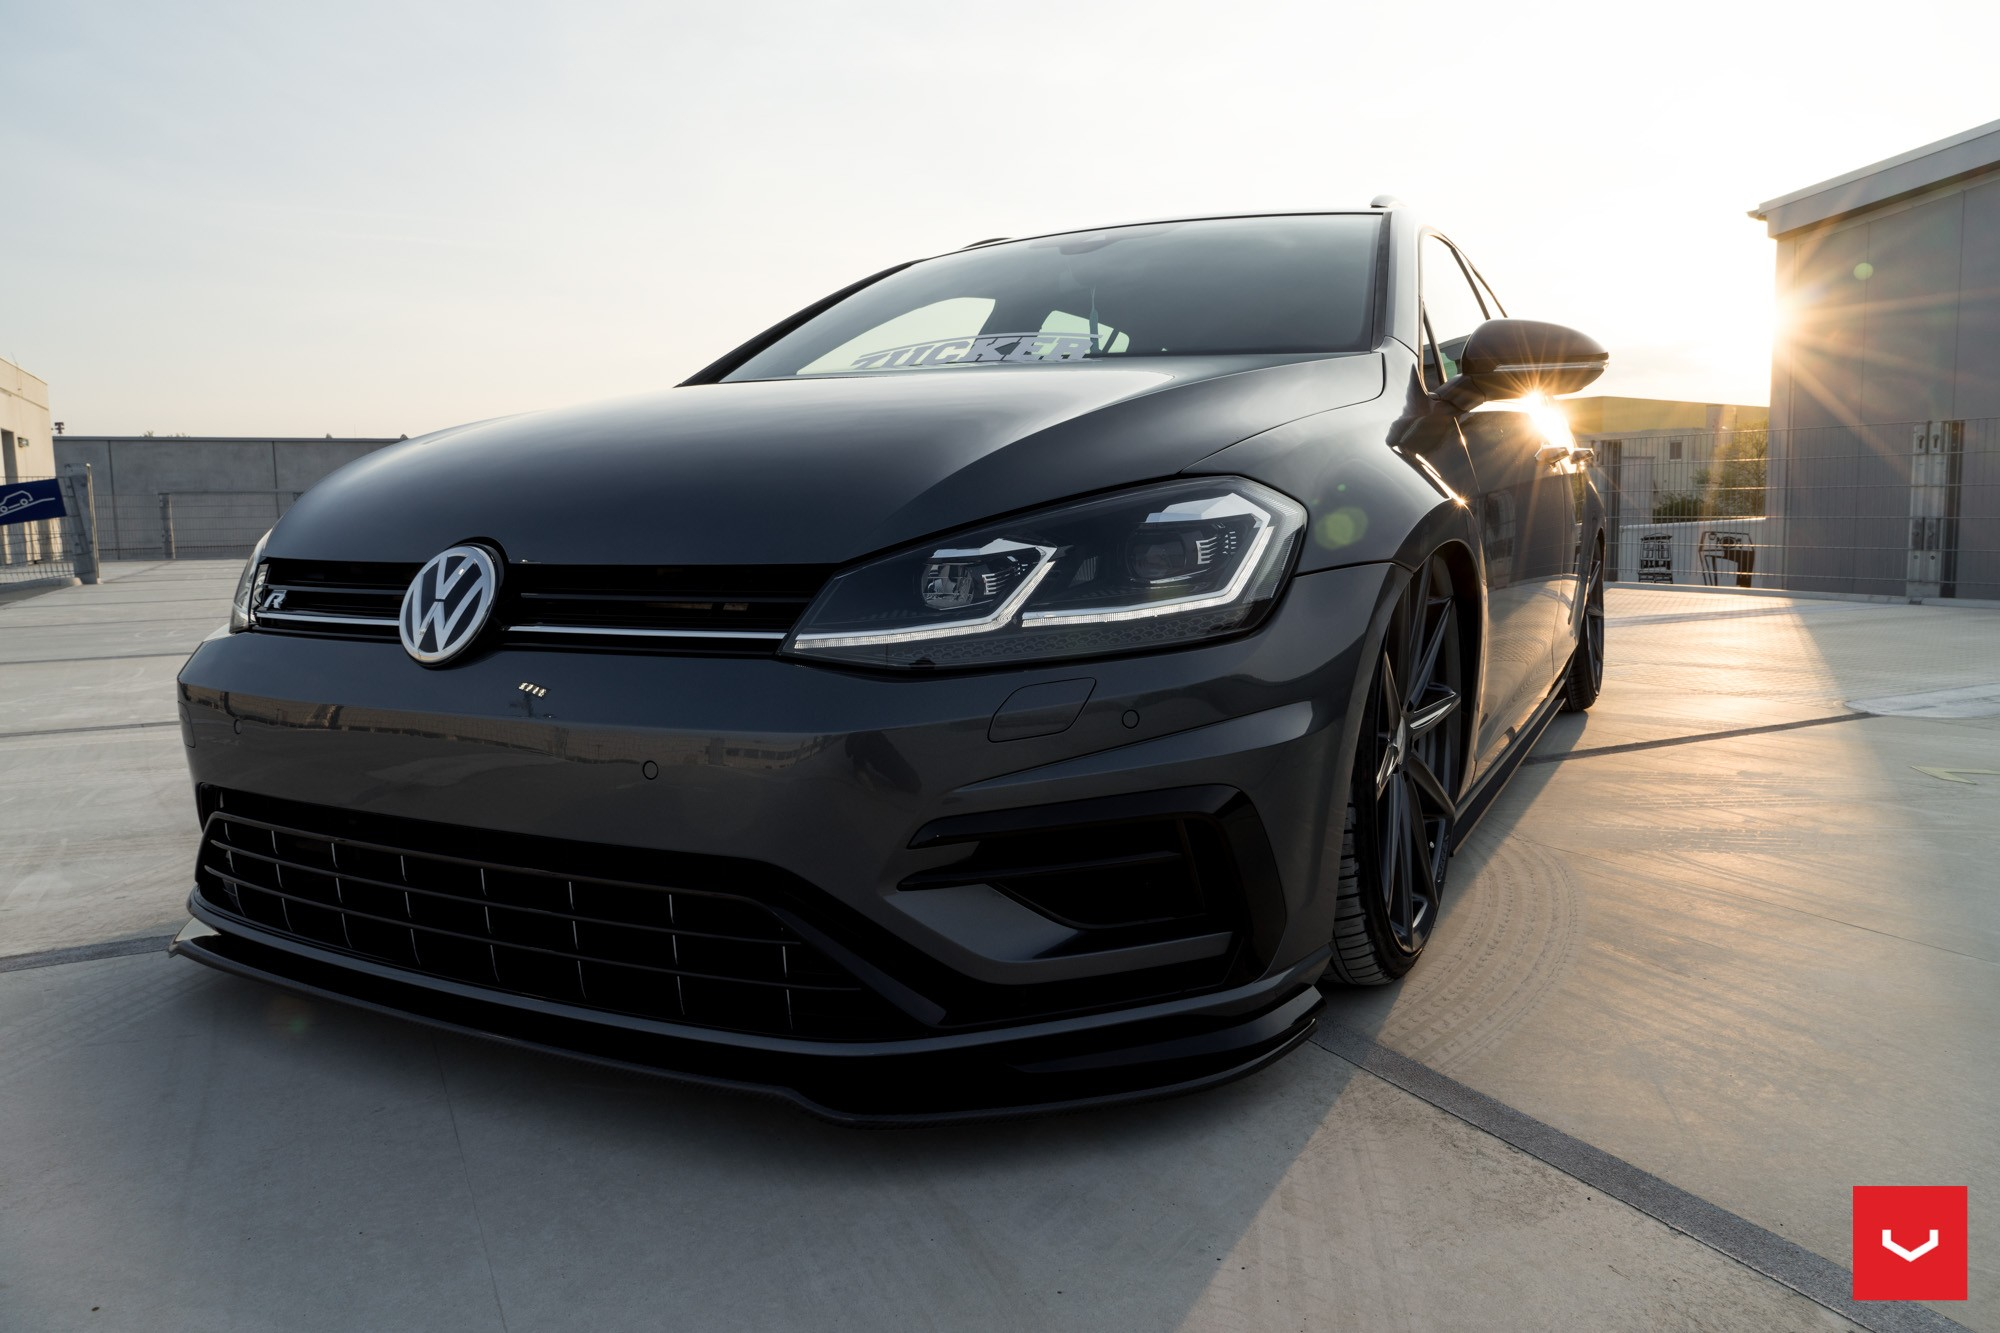 2017 golf r variant gets stanced on vossen wheels for tuning debut autoevolution. Black Bedroom Furniture Sets. Home Design Ideas